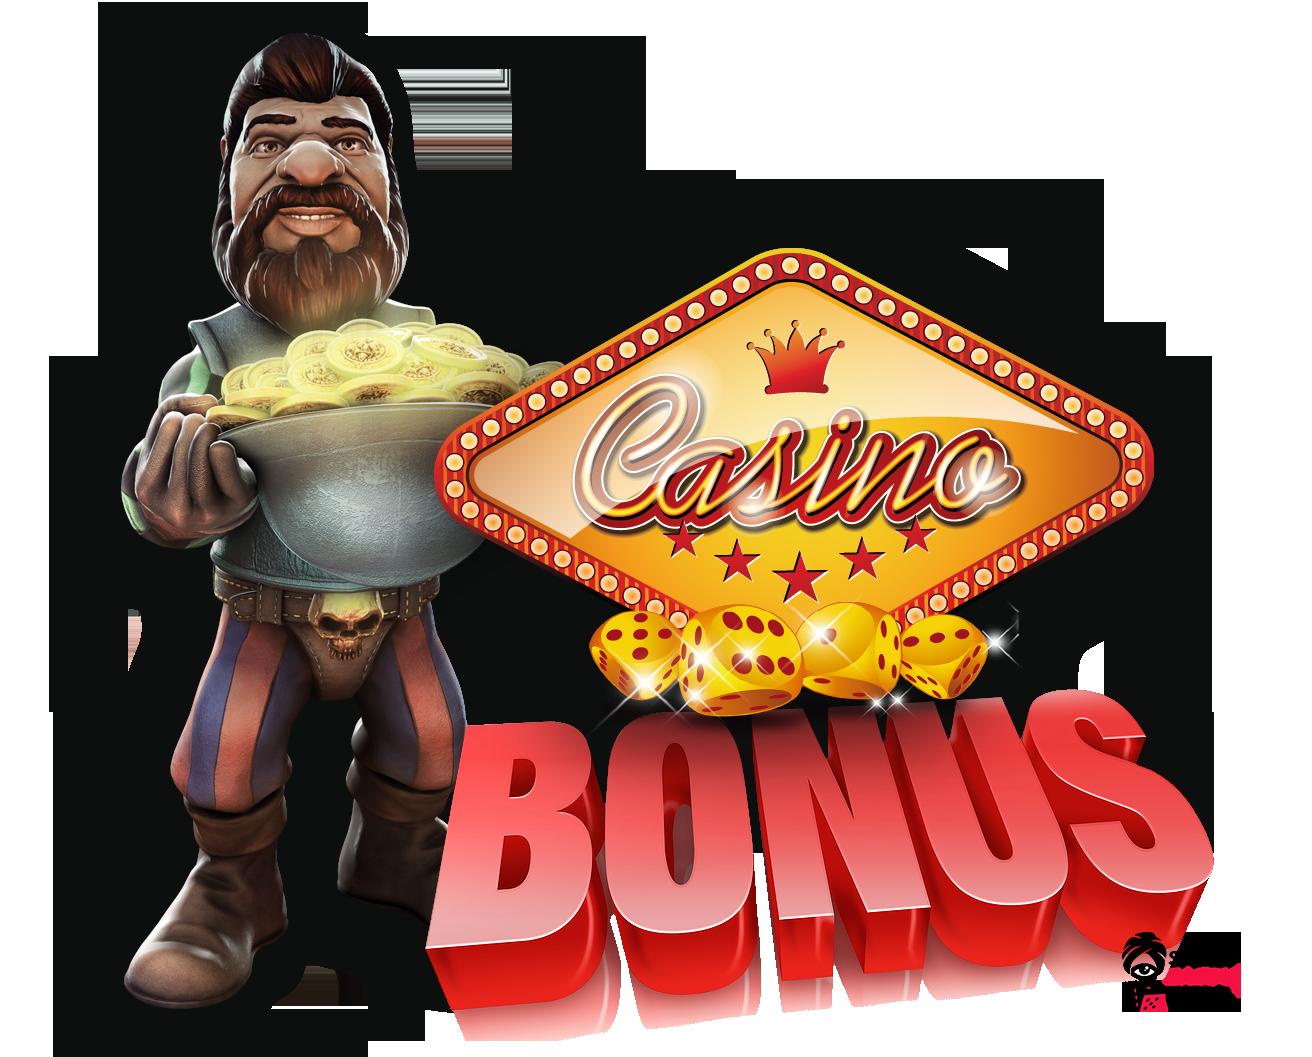 Online-casino-reitings-vērtēšanas-kritēriji-Piemaksas